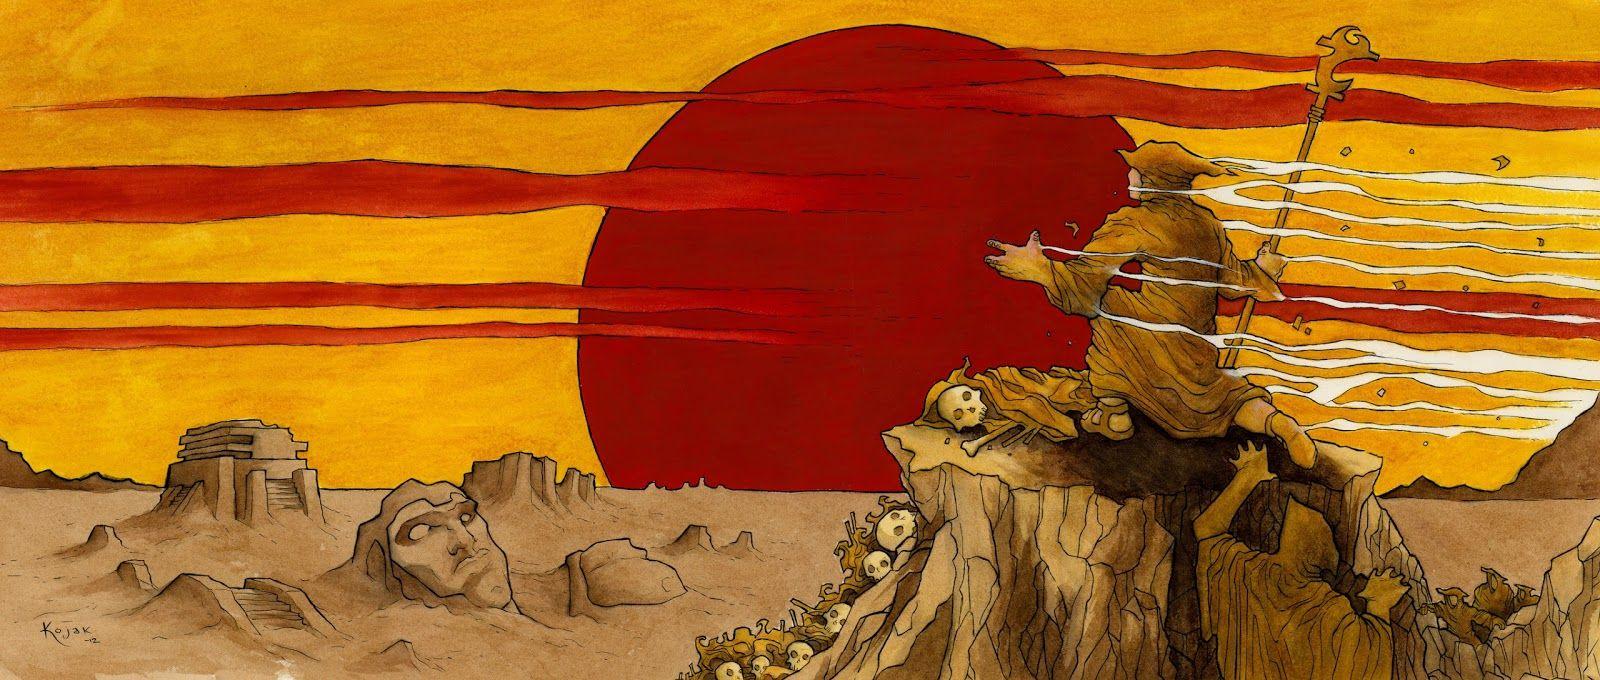 Egypt, The Sun Stoner rock, Egypt